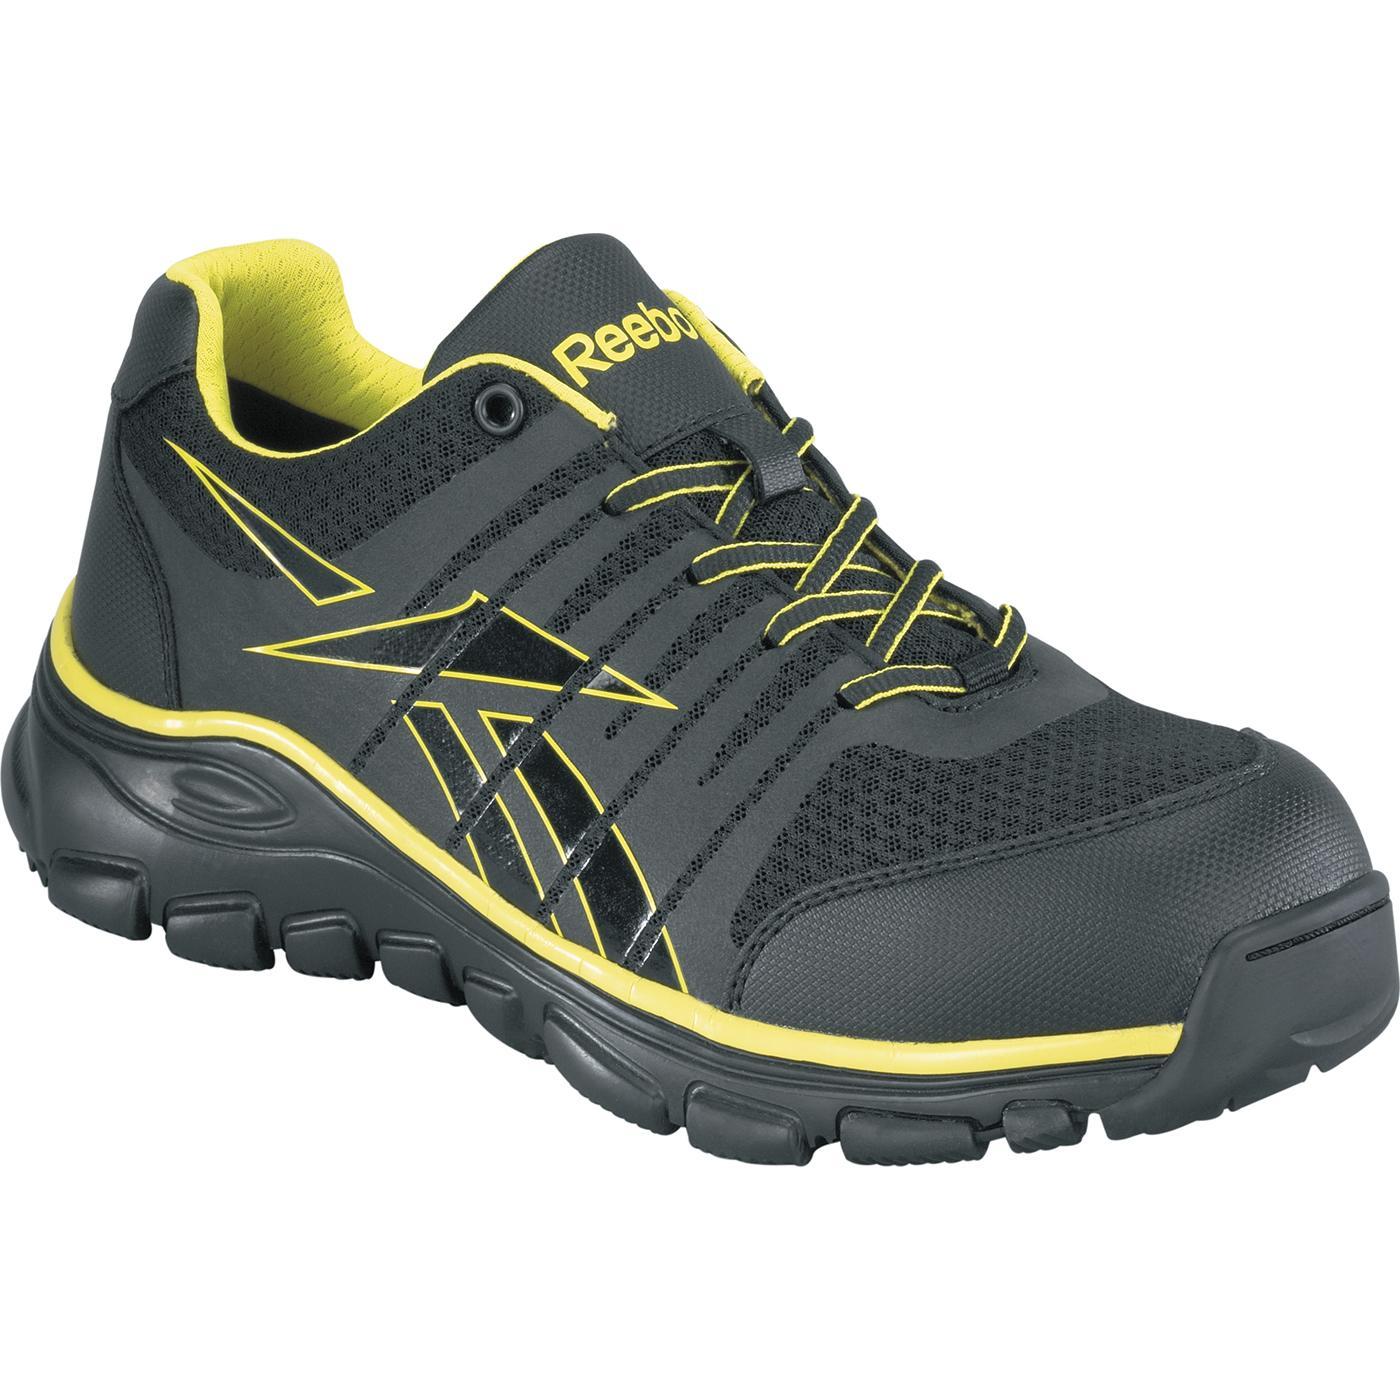 58a396a75c4 Reebok Arion Composite Toe Static-Dissipative Athletic Work ShoeReebok  Arion Composite Toe Static-Dissipative Athletic Work Shoe